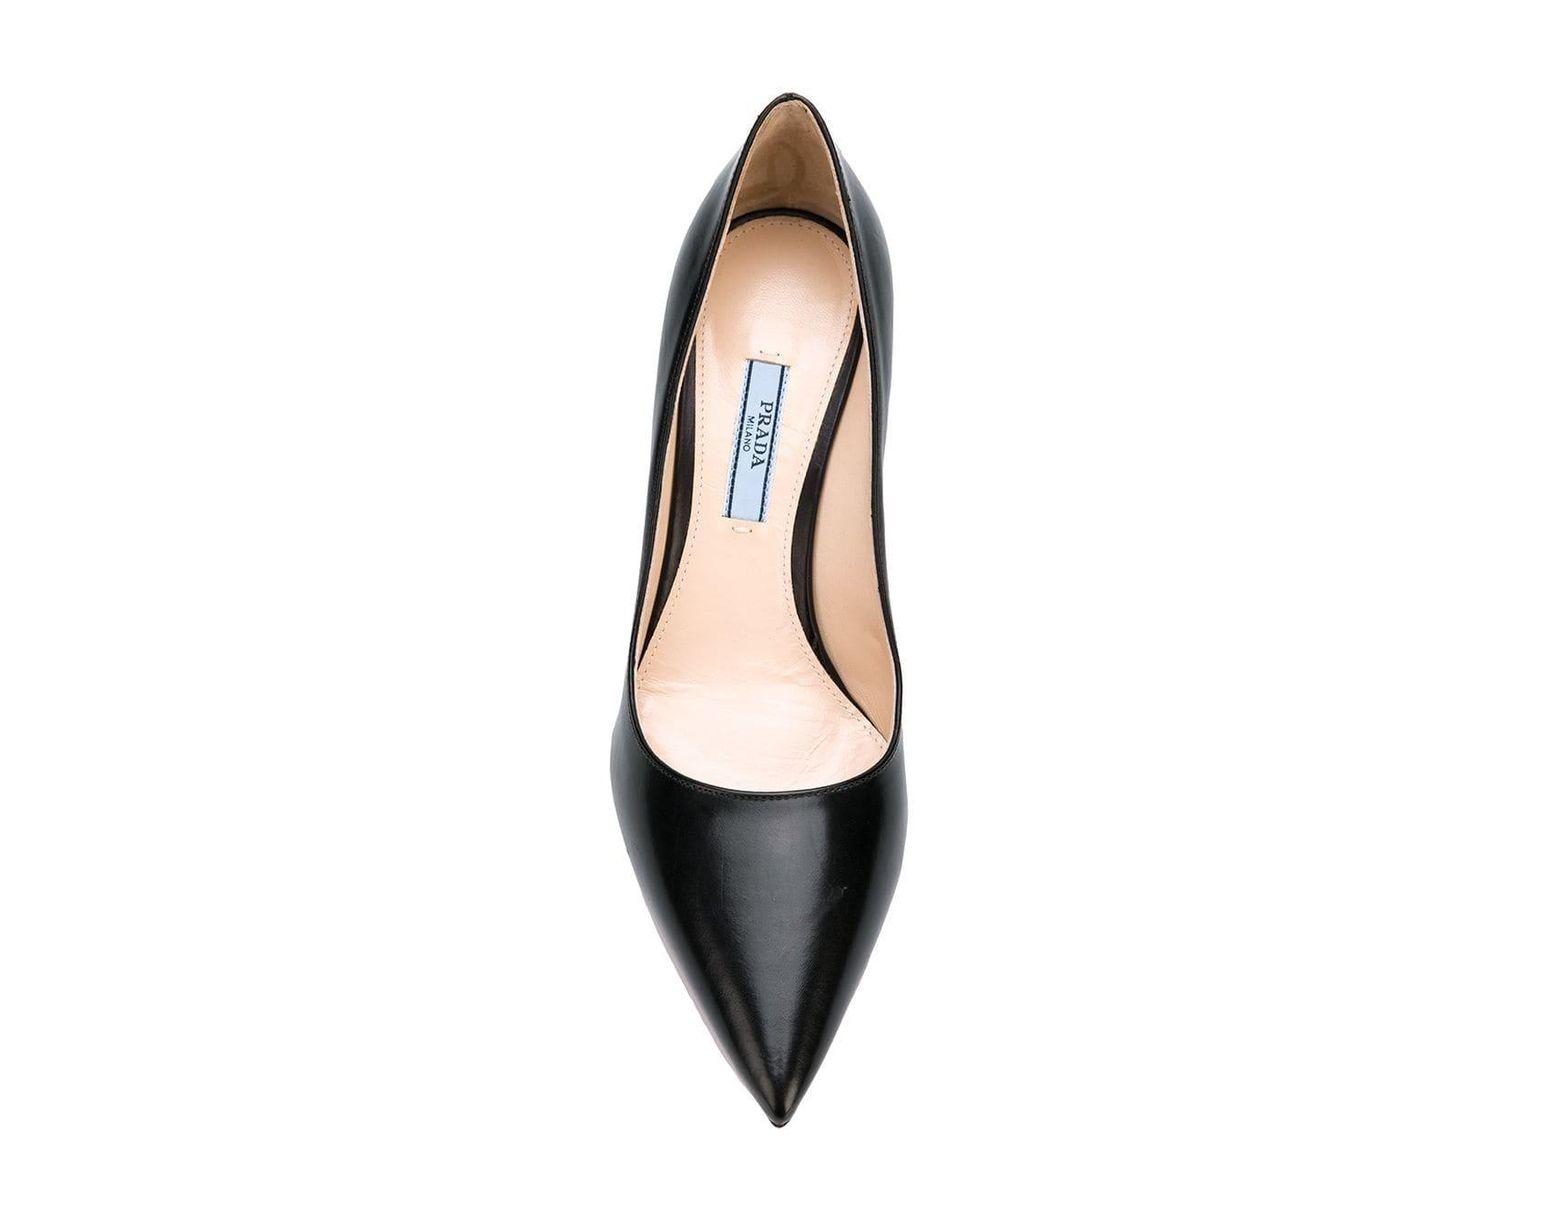 Zapatos Clásicos Color Tacón Prada Negro Lyst De OTkZuXPi